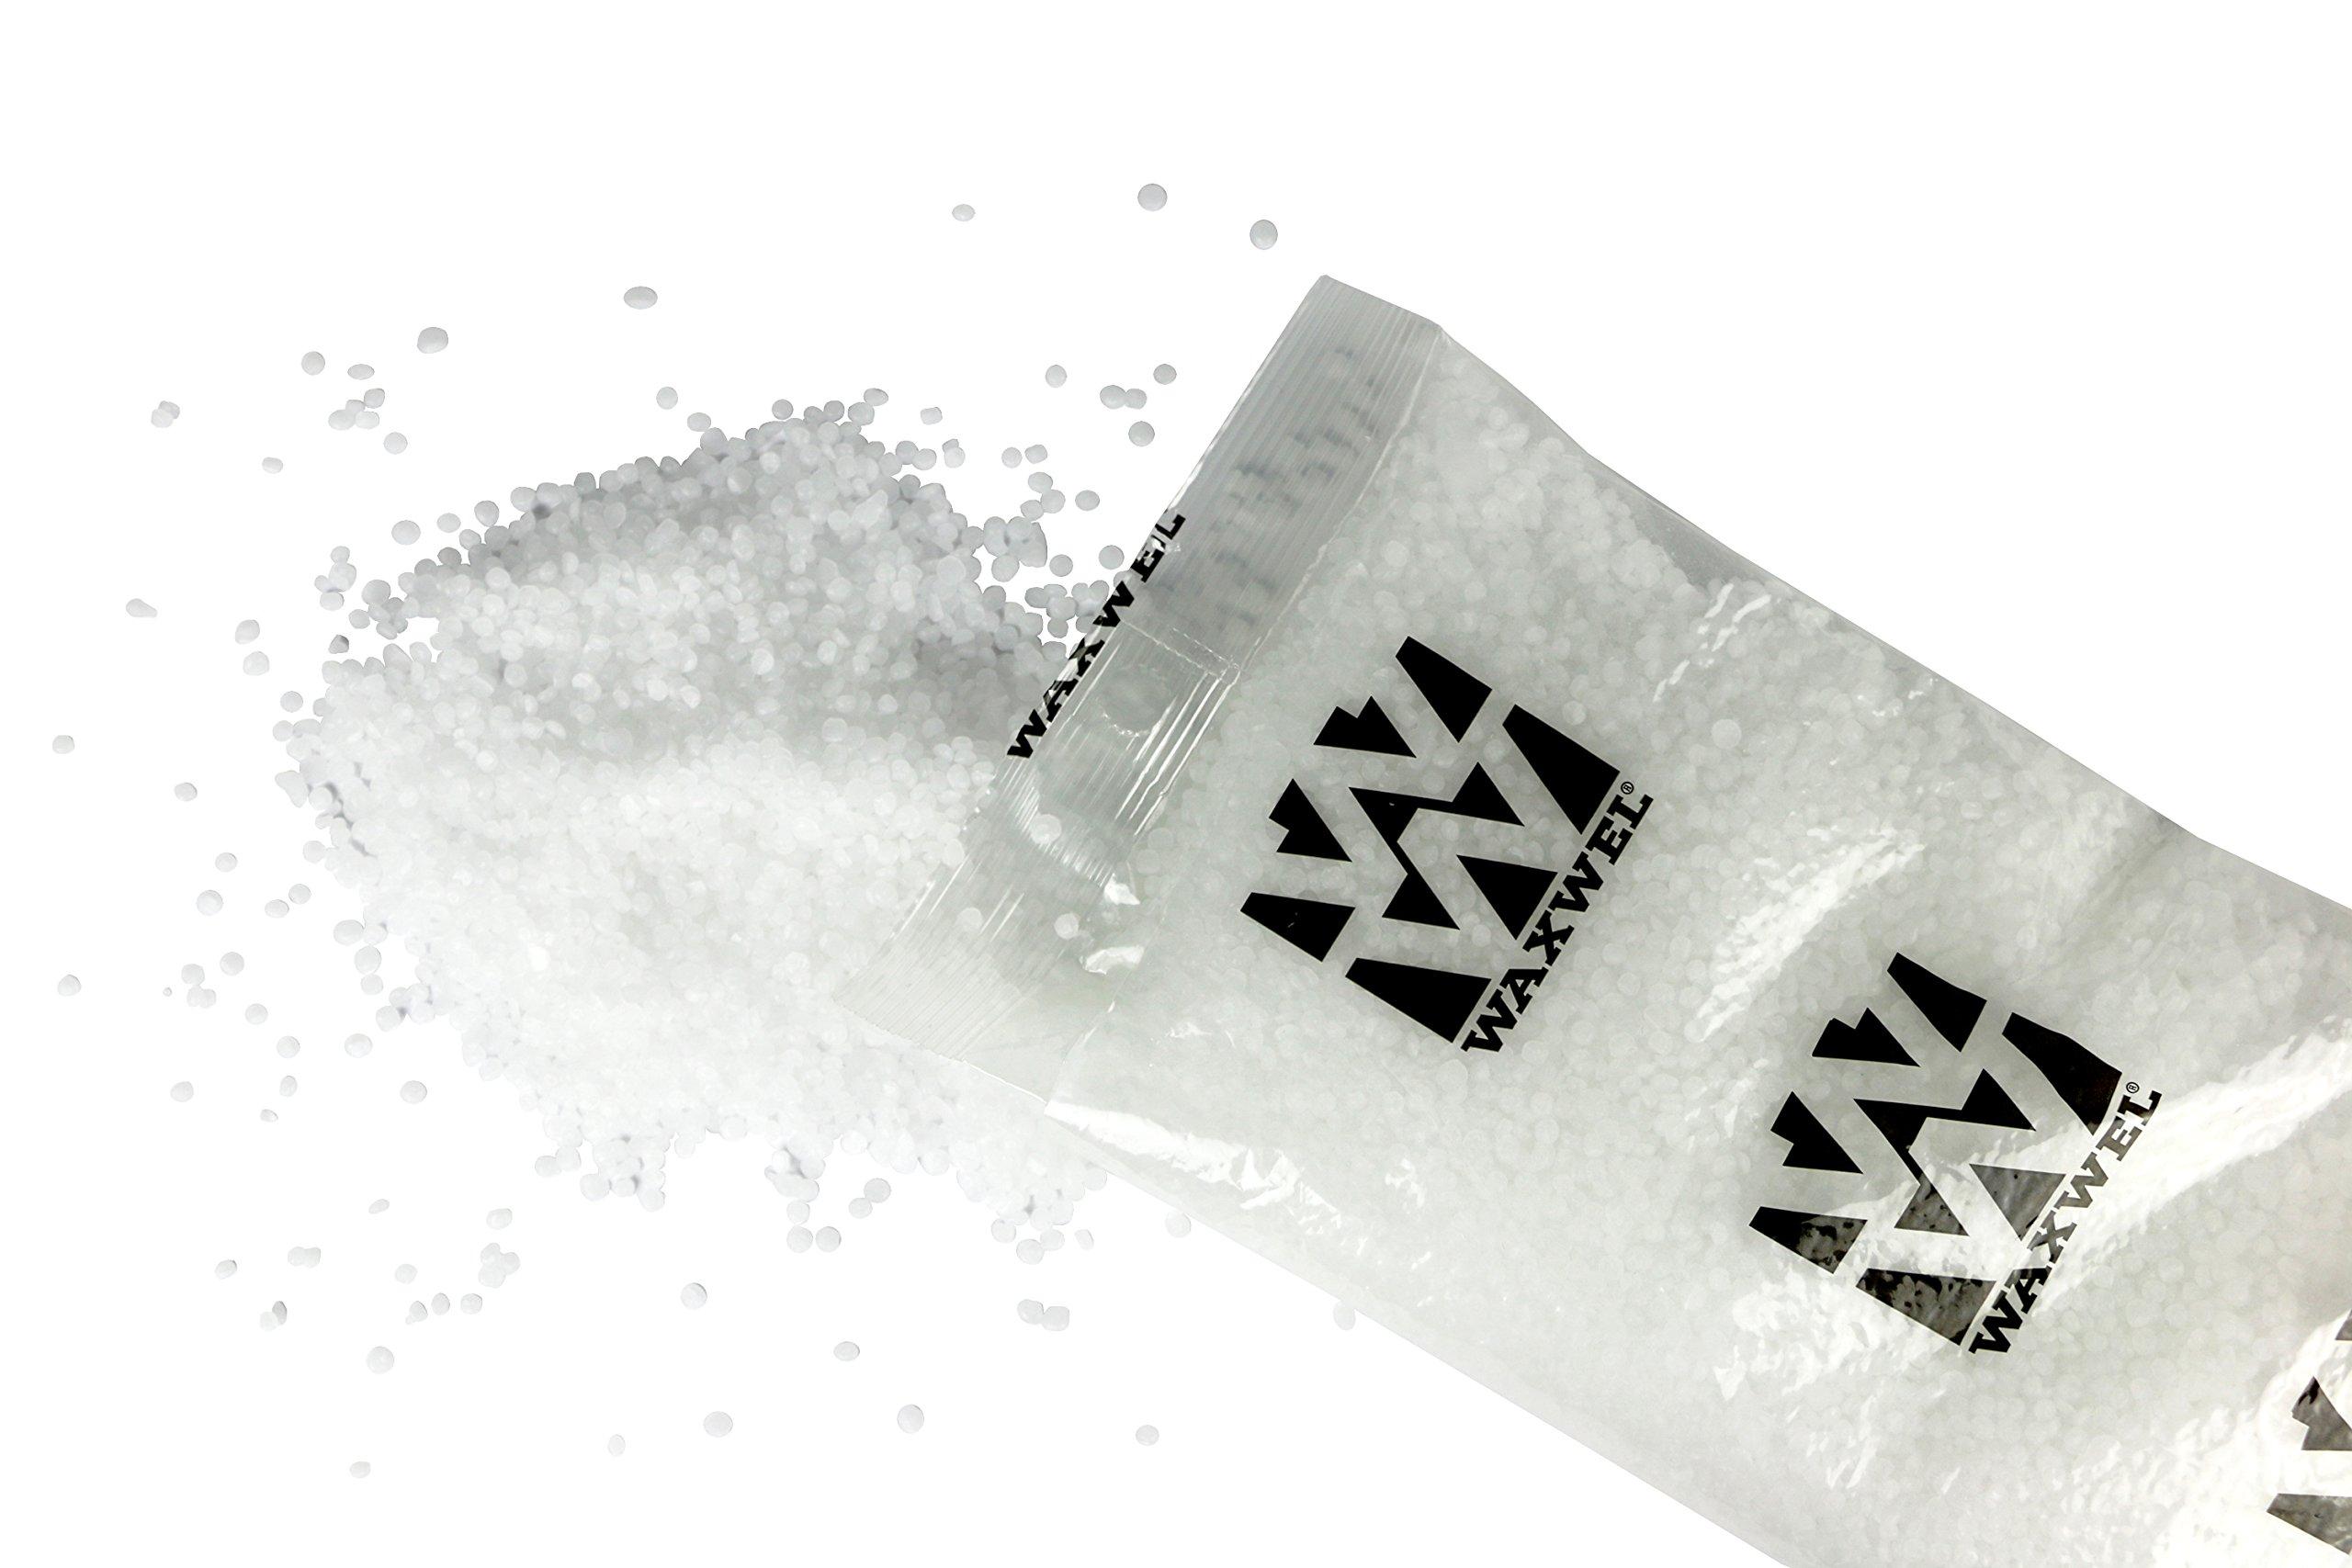 WaxWel Paraffin Bath Refill Wax Beads, 36 lb Case, Citrus